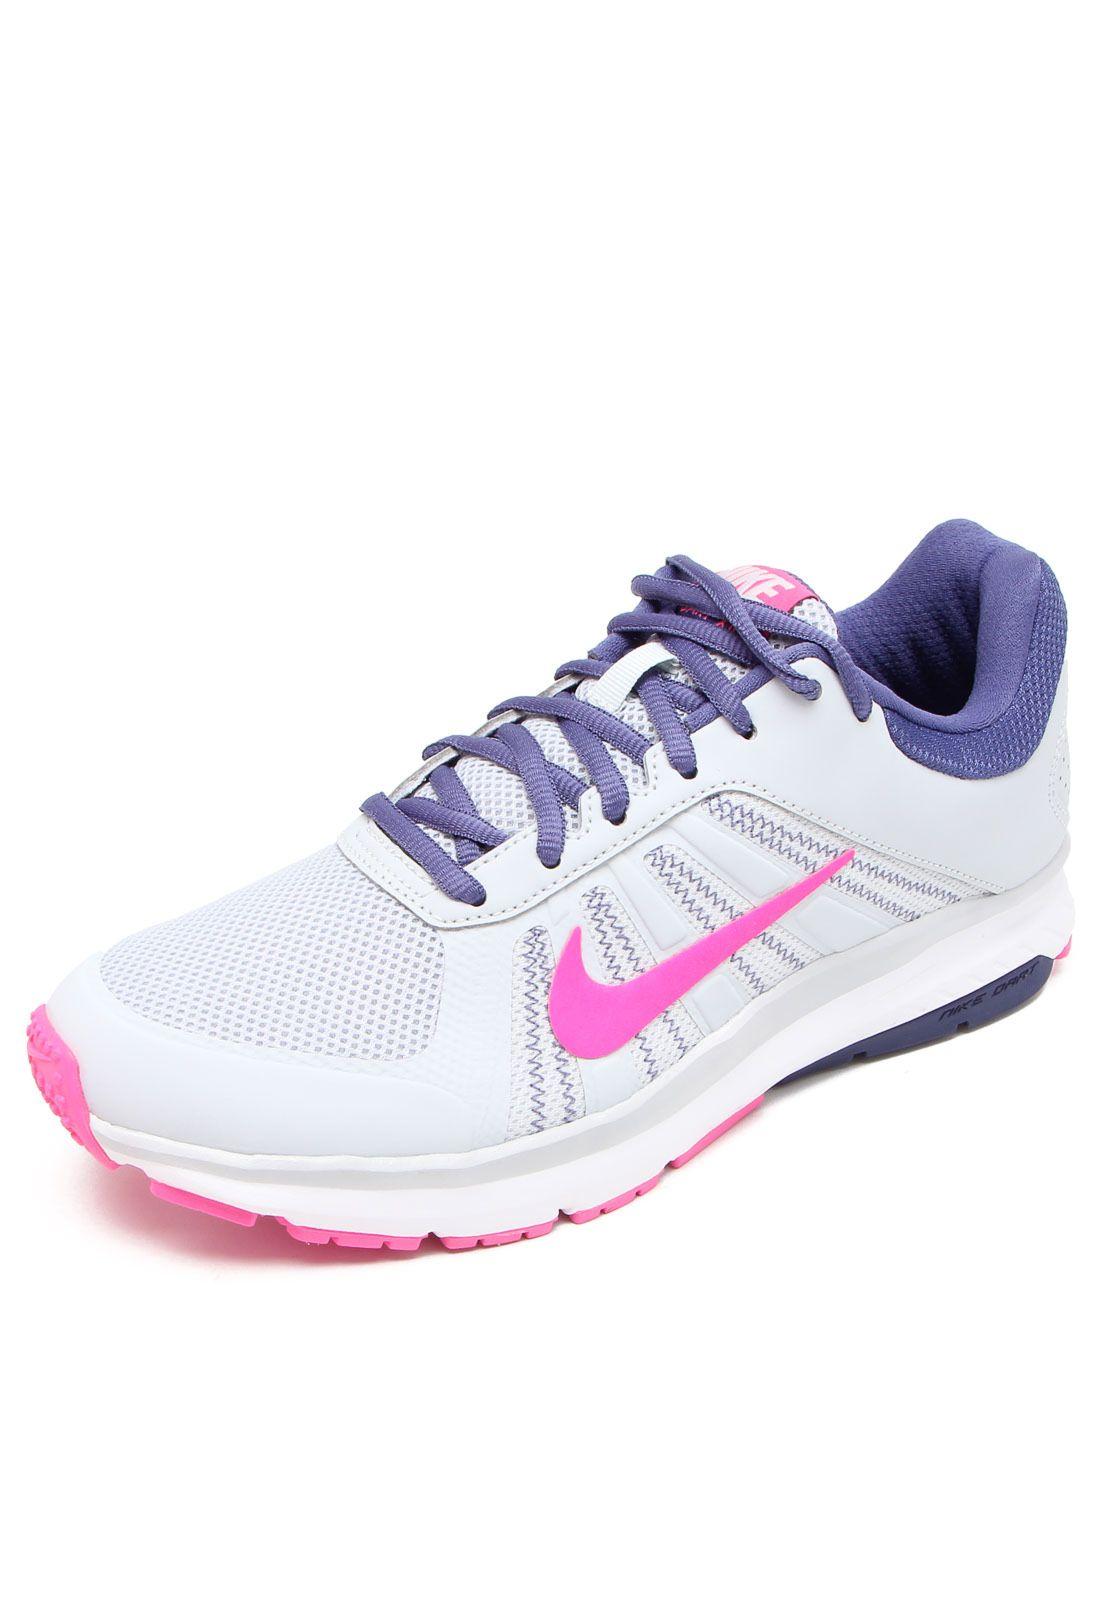 Tênis Nike Wmns Dart 12 MSL Feminino